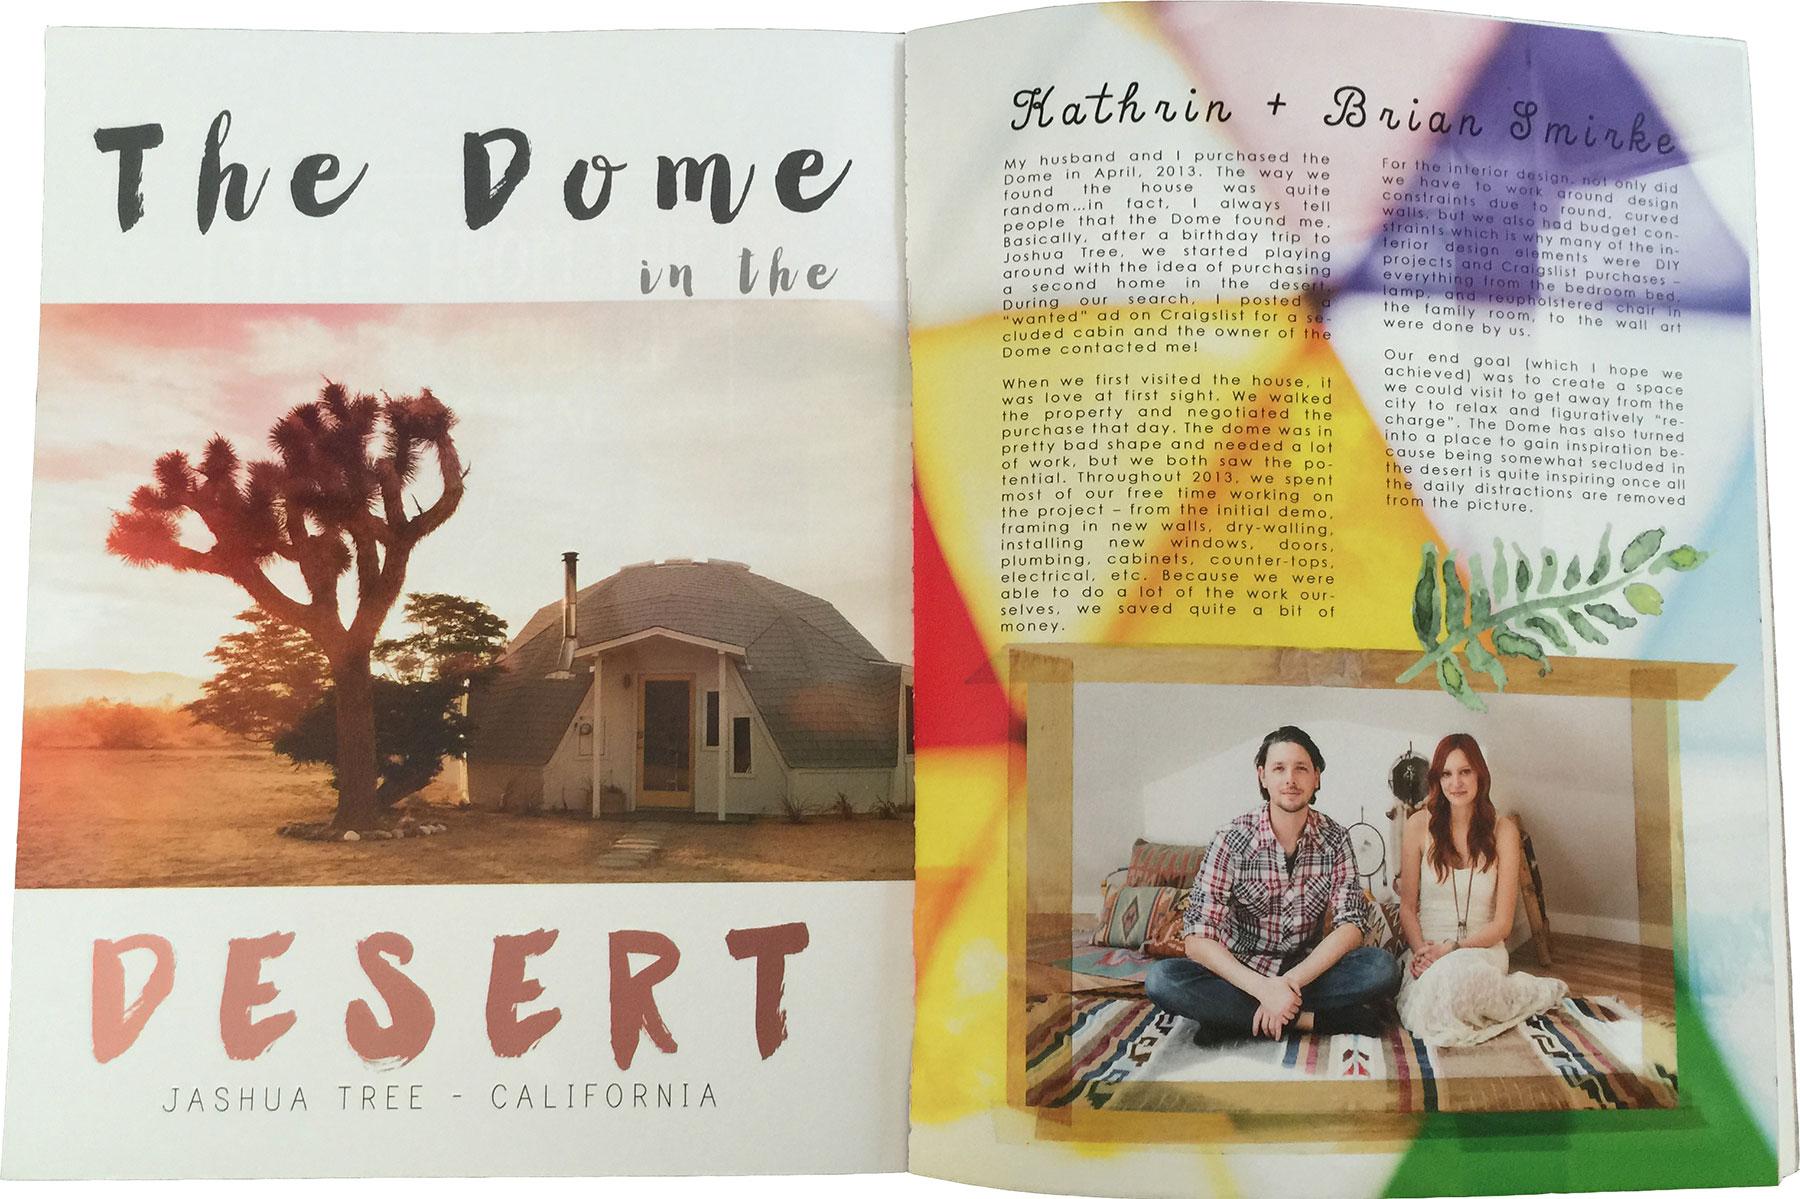 Bohemian Collective Magazine ▲ www.WeAreInOurElement.com